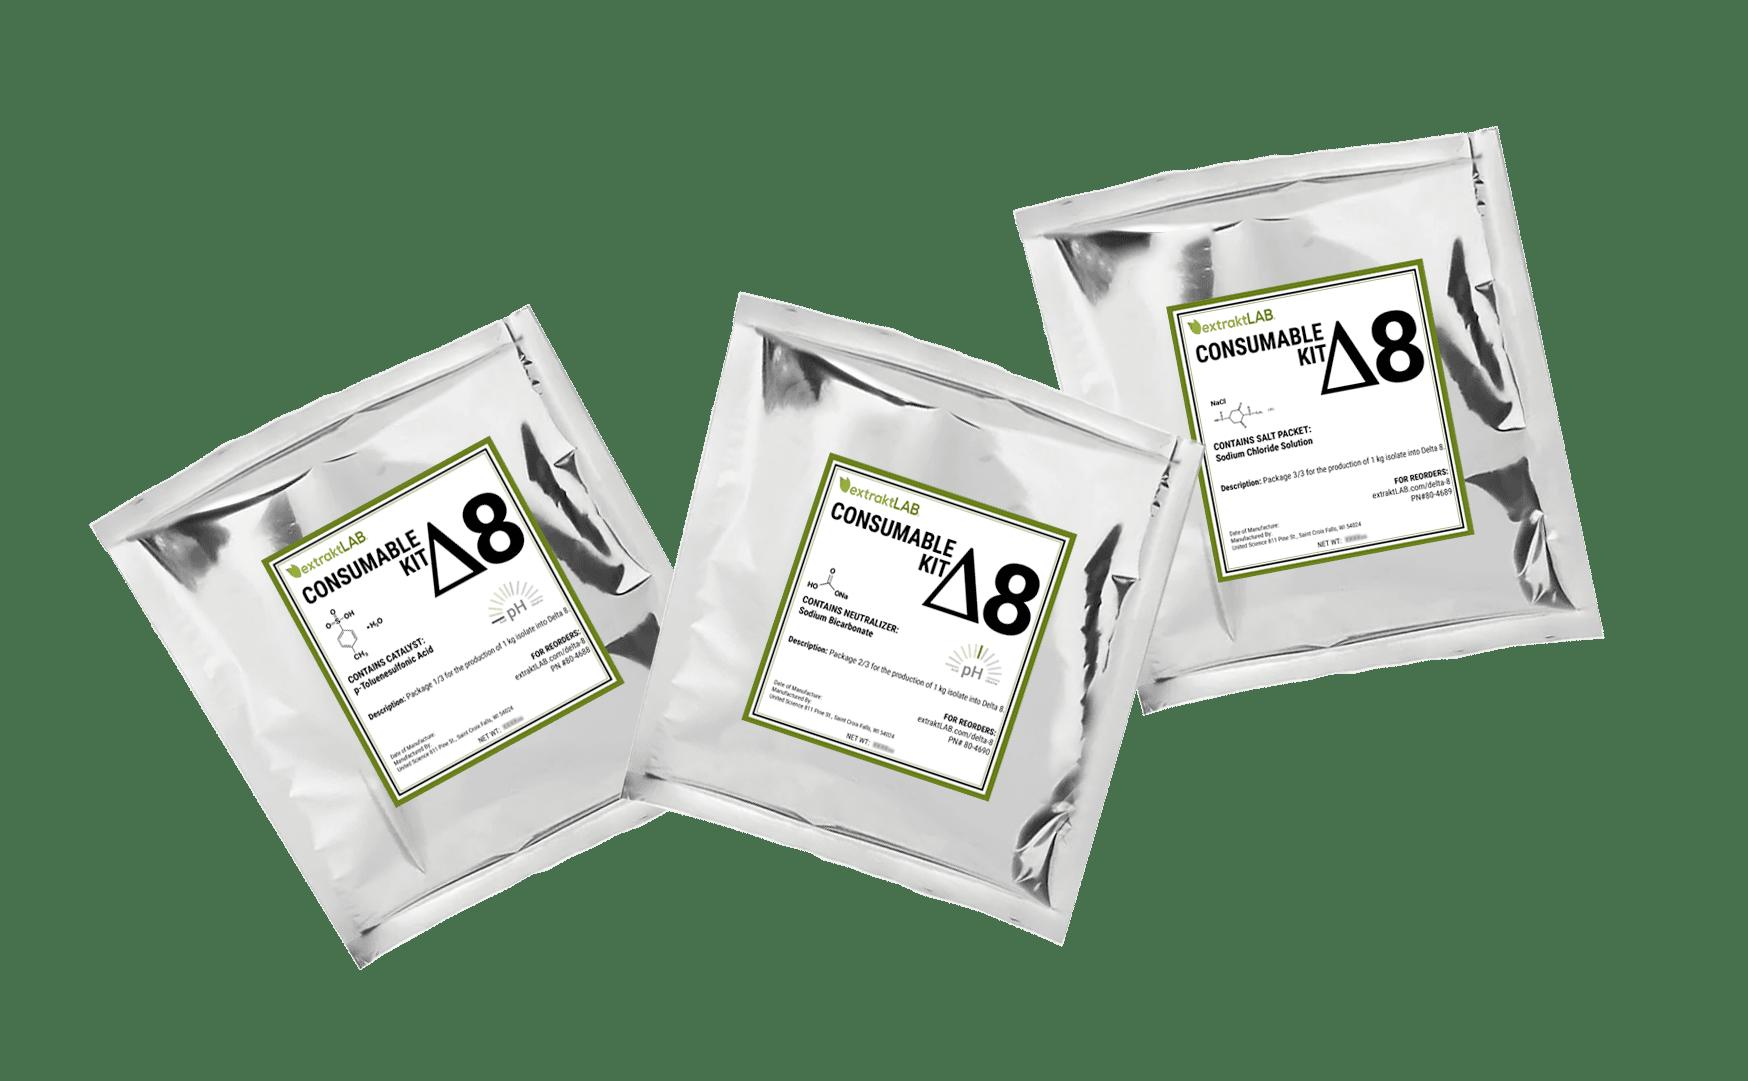 Delta 8 Consumable Kit